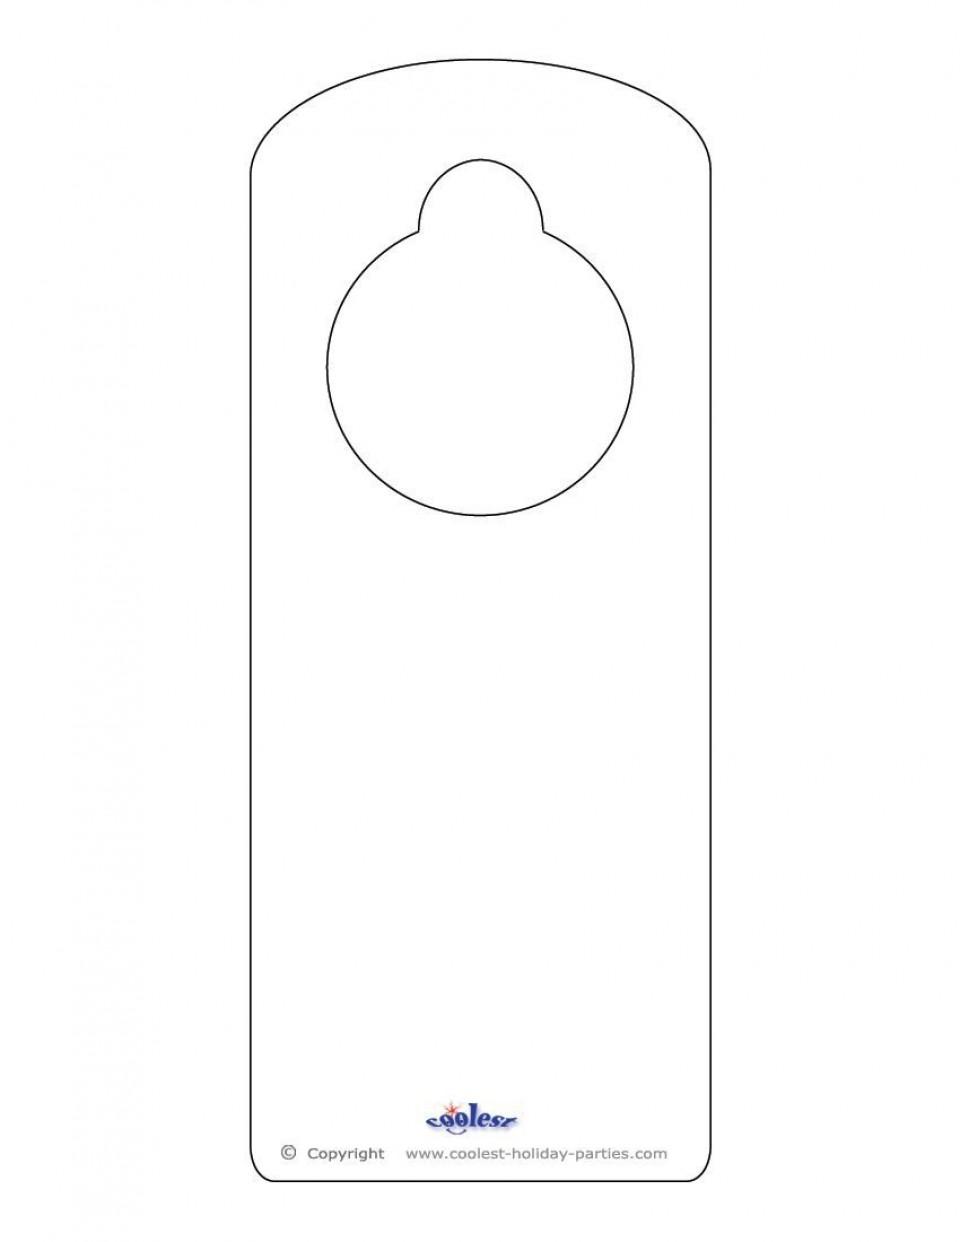 008 Unbelievable Free Printable Template For Door Hanger High Definition 960